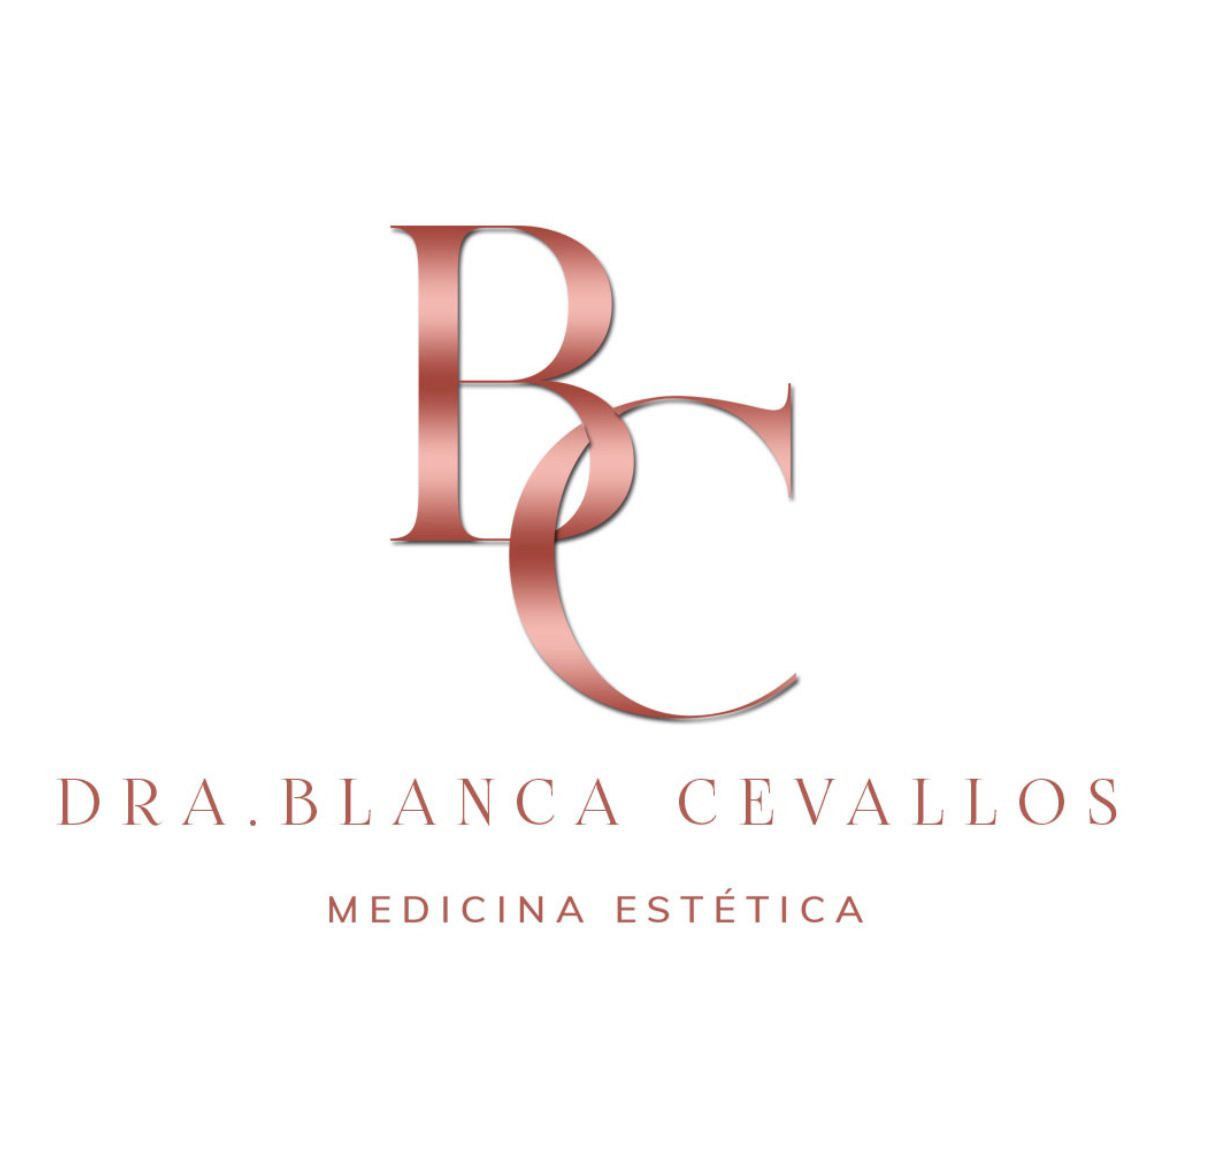 Dra. Blanca Cevallos Madrid, Médico Estético